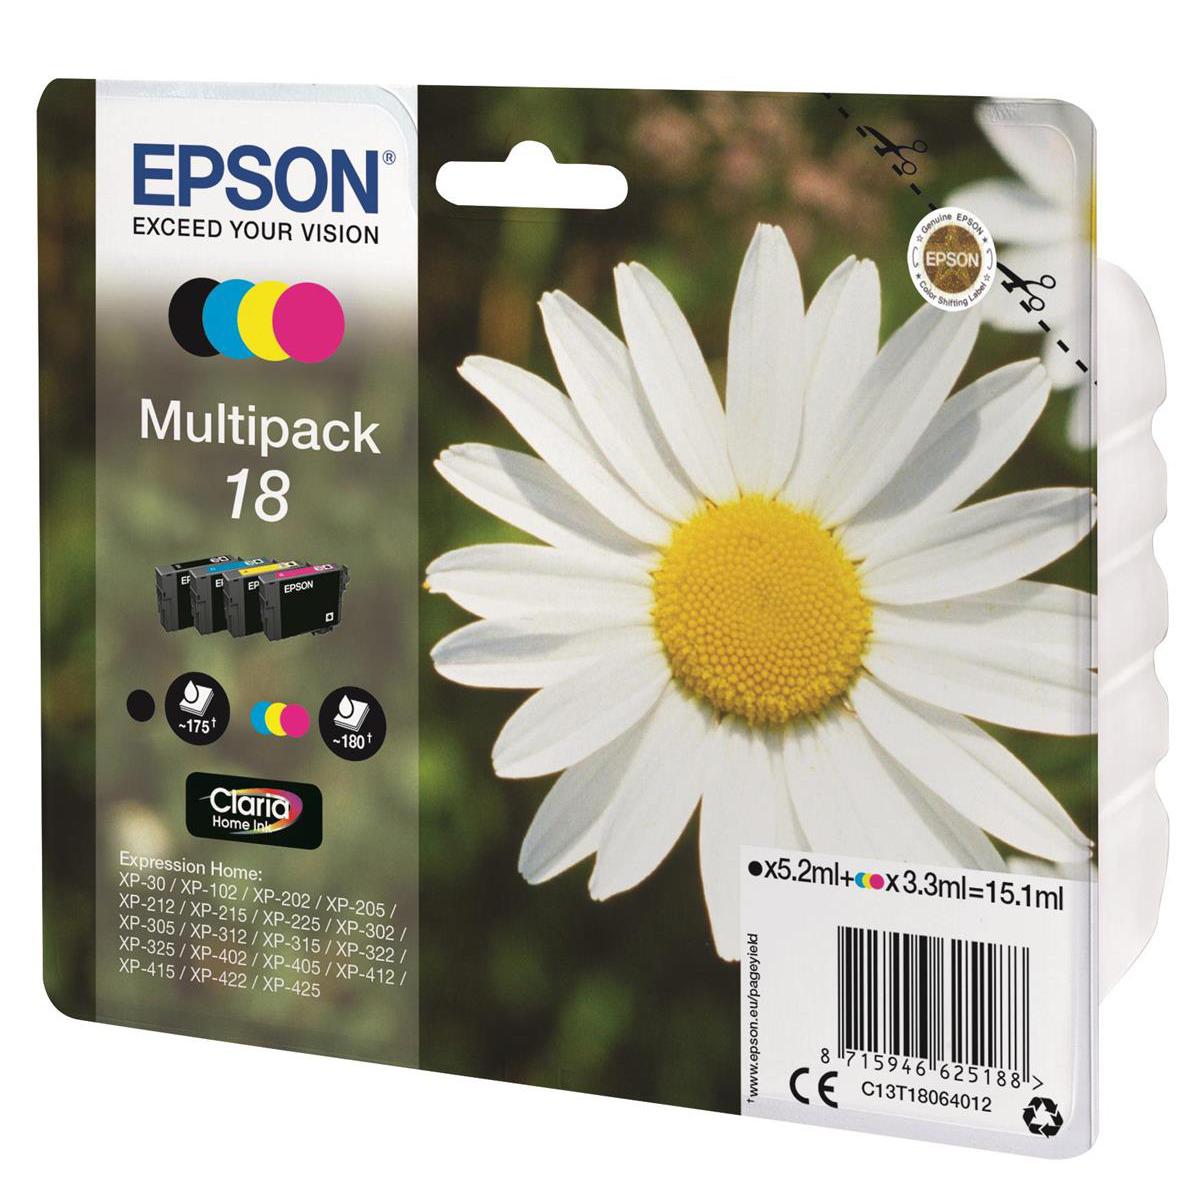 Epson 18 Inkjet Cartridges Daisy Black 5.3ml Cyan/Magenta/Yellow 3.3ml Ref C13T18064012 [Pack 4]